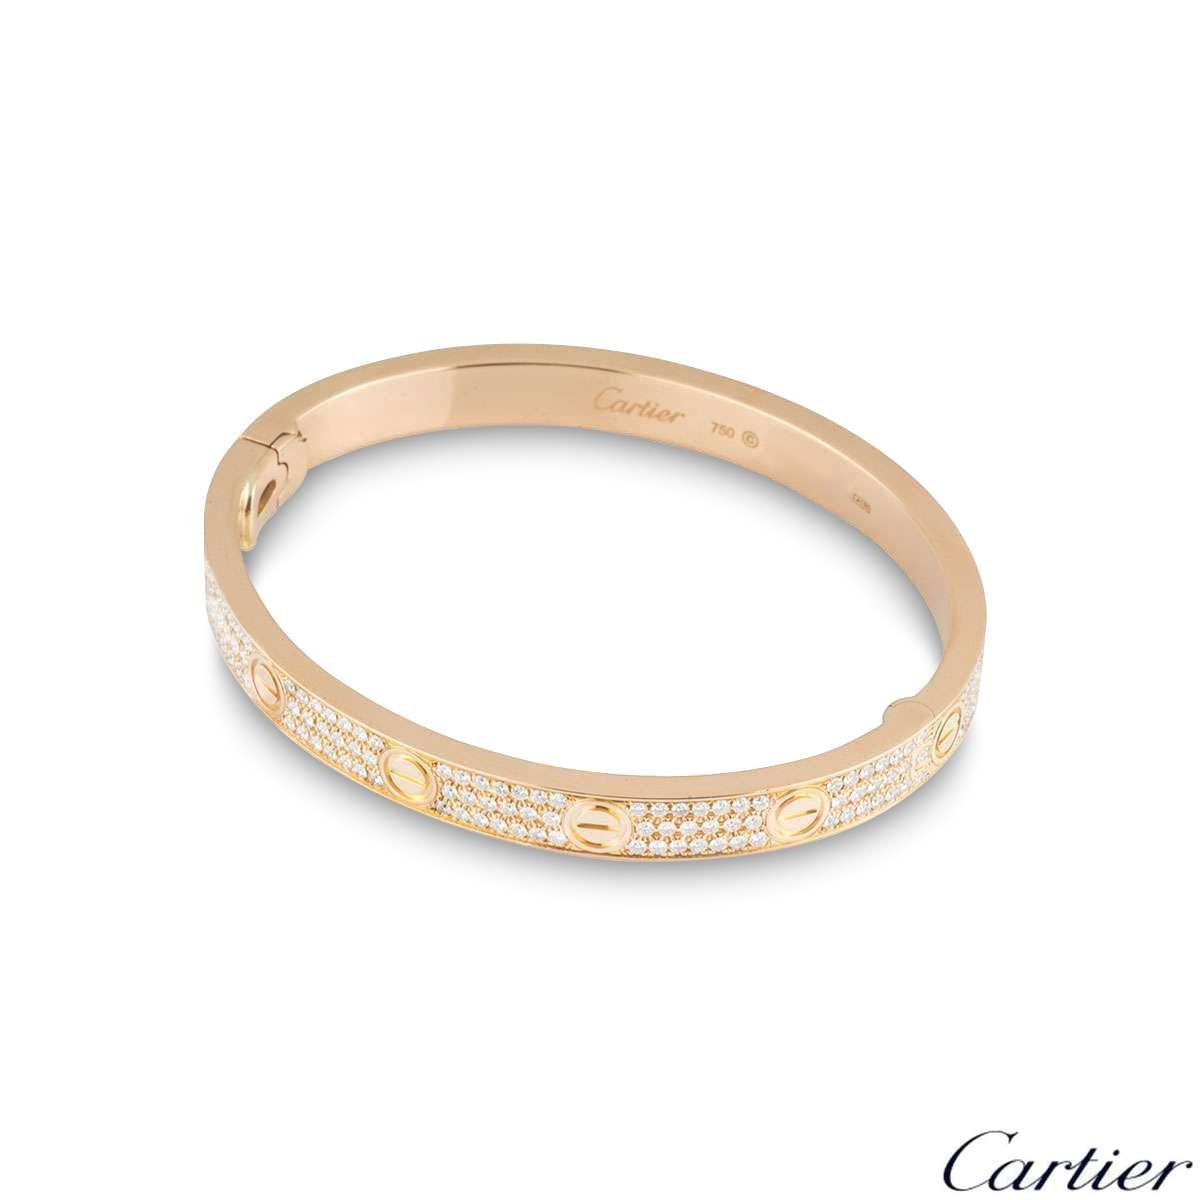 Cartier Rose Gold Full Pave Diamond Love Bracelet Size 16 N6036916